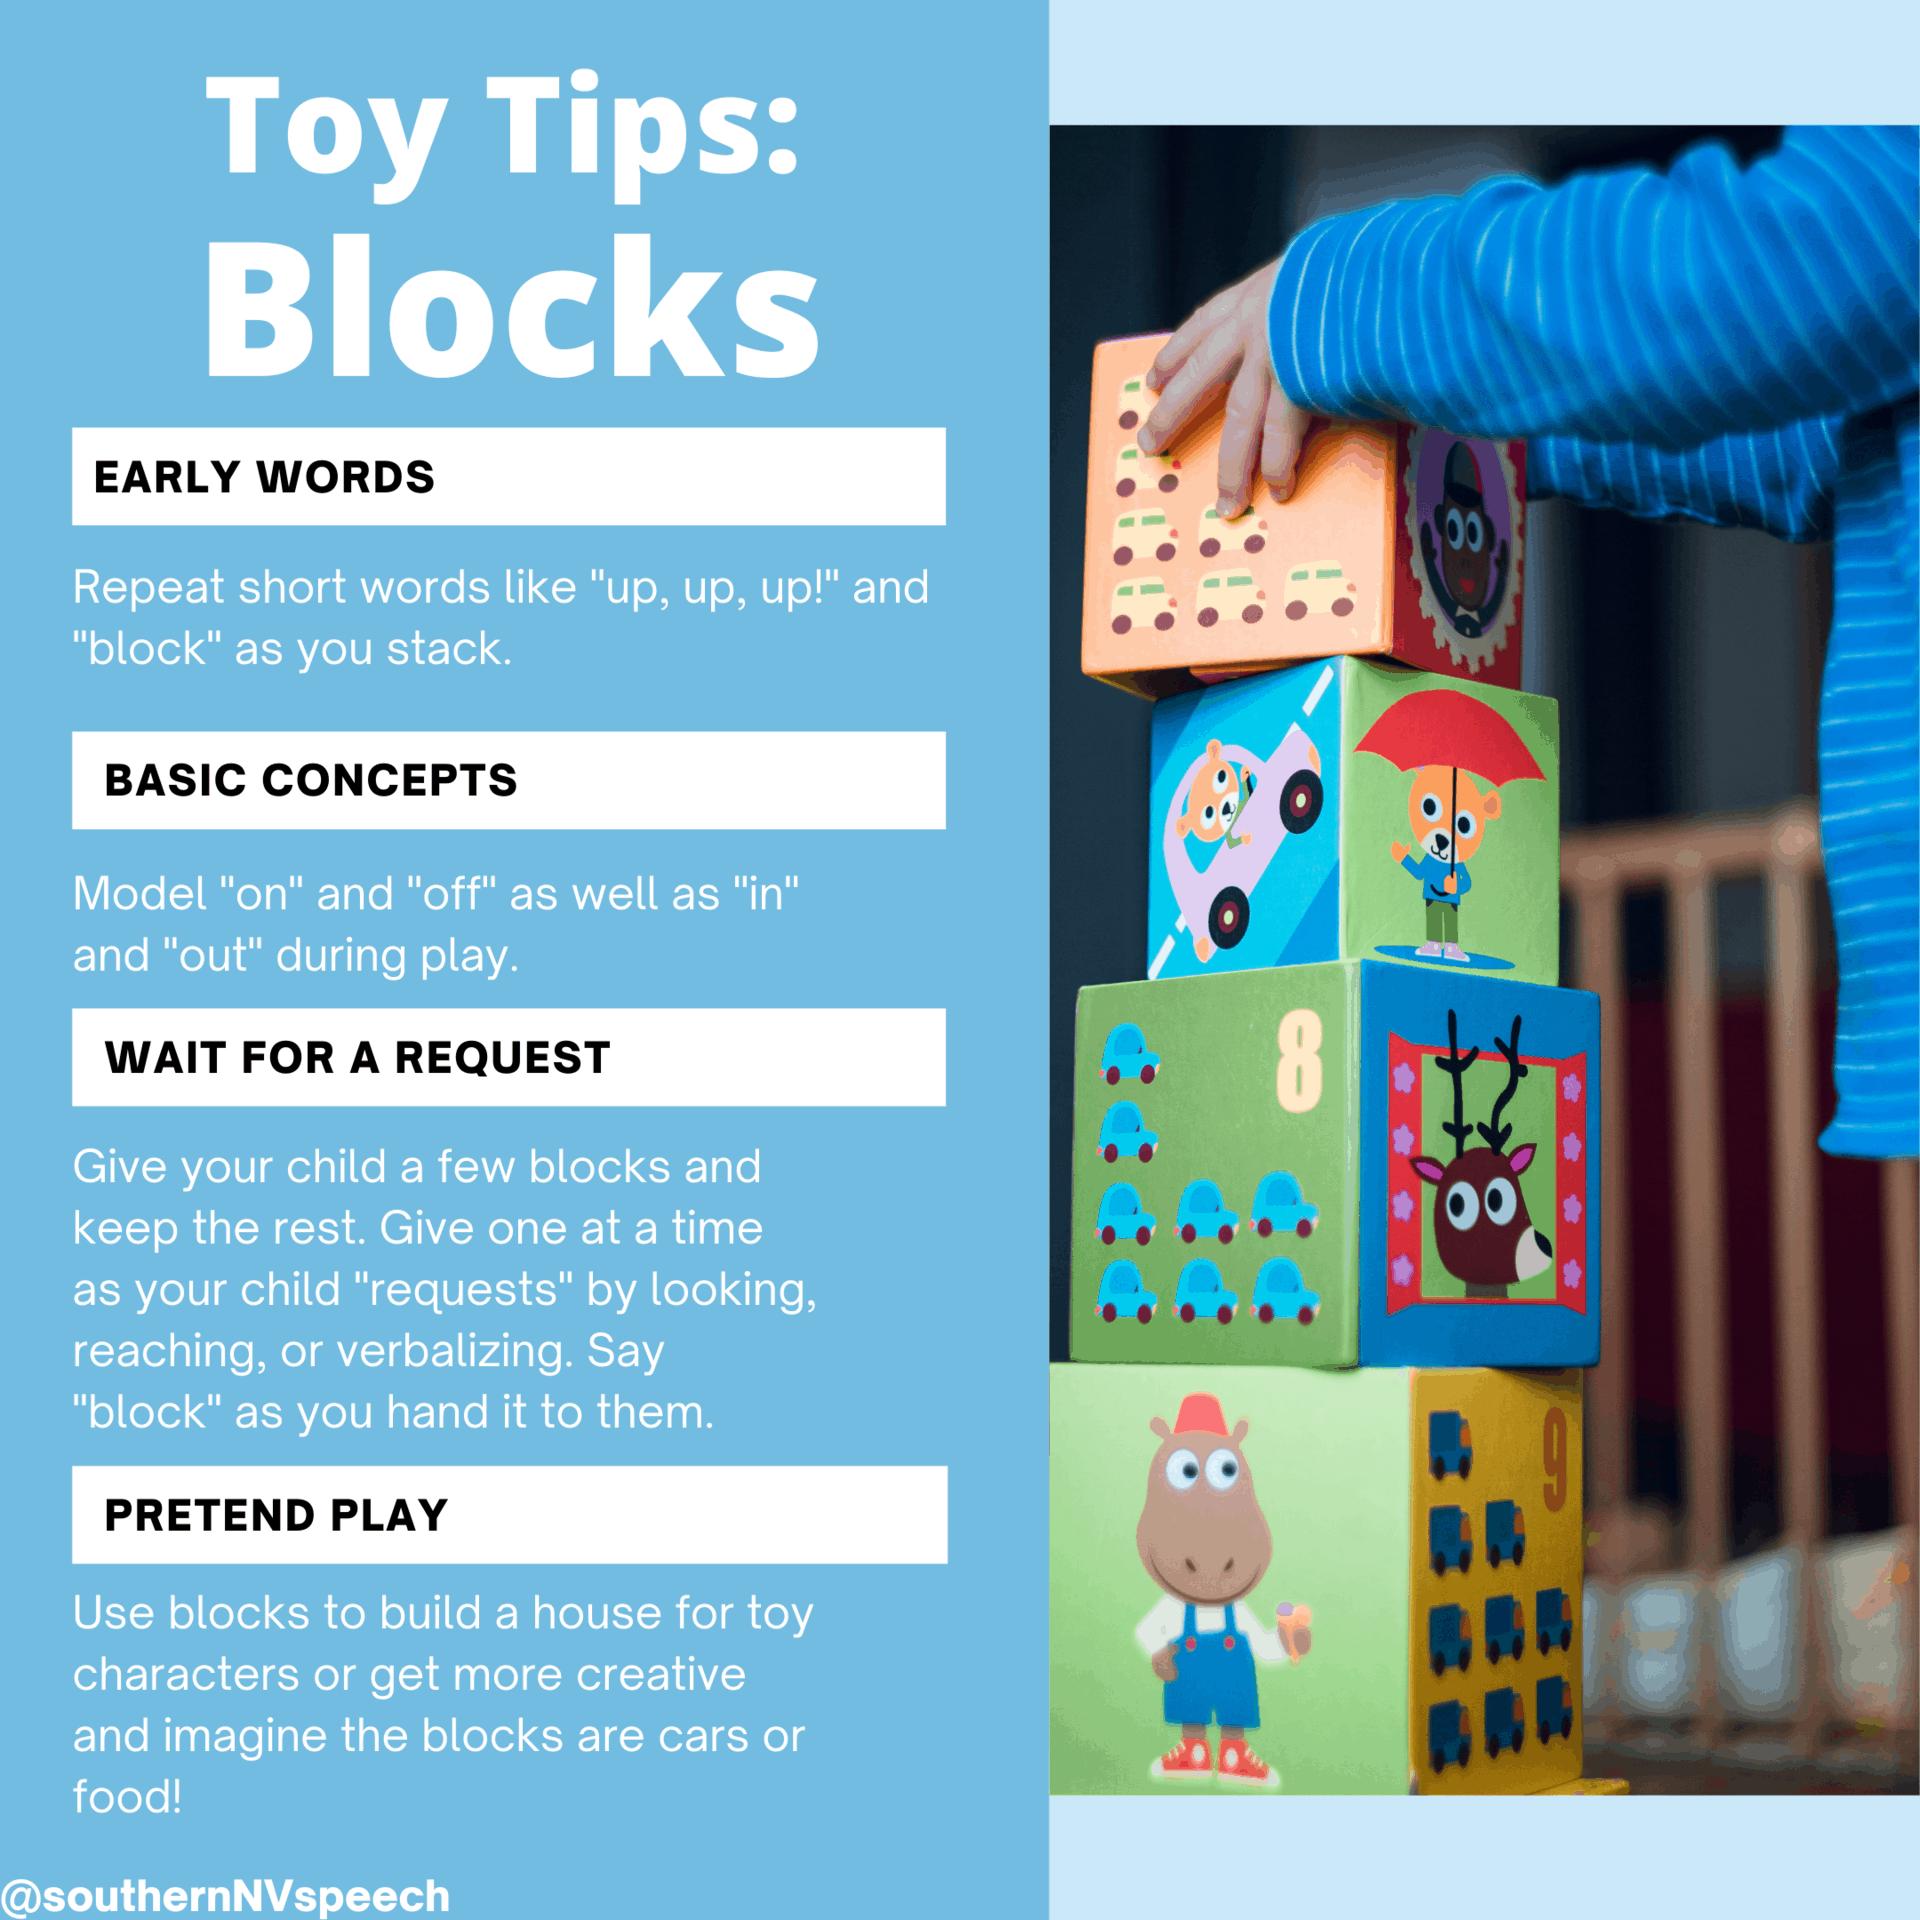 Toy Tips: Blocks